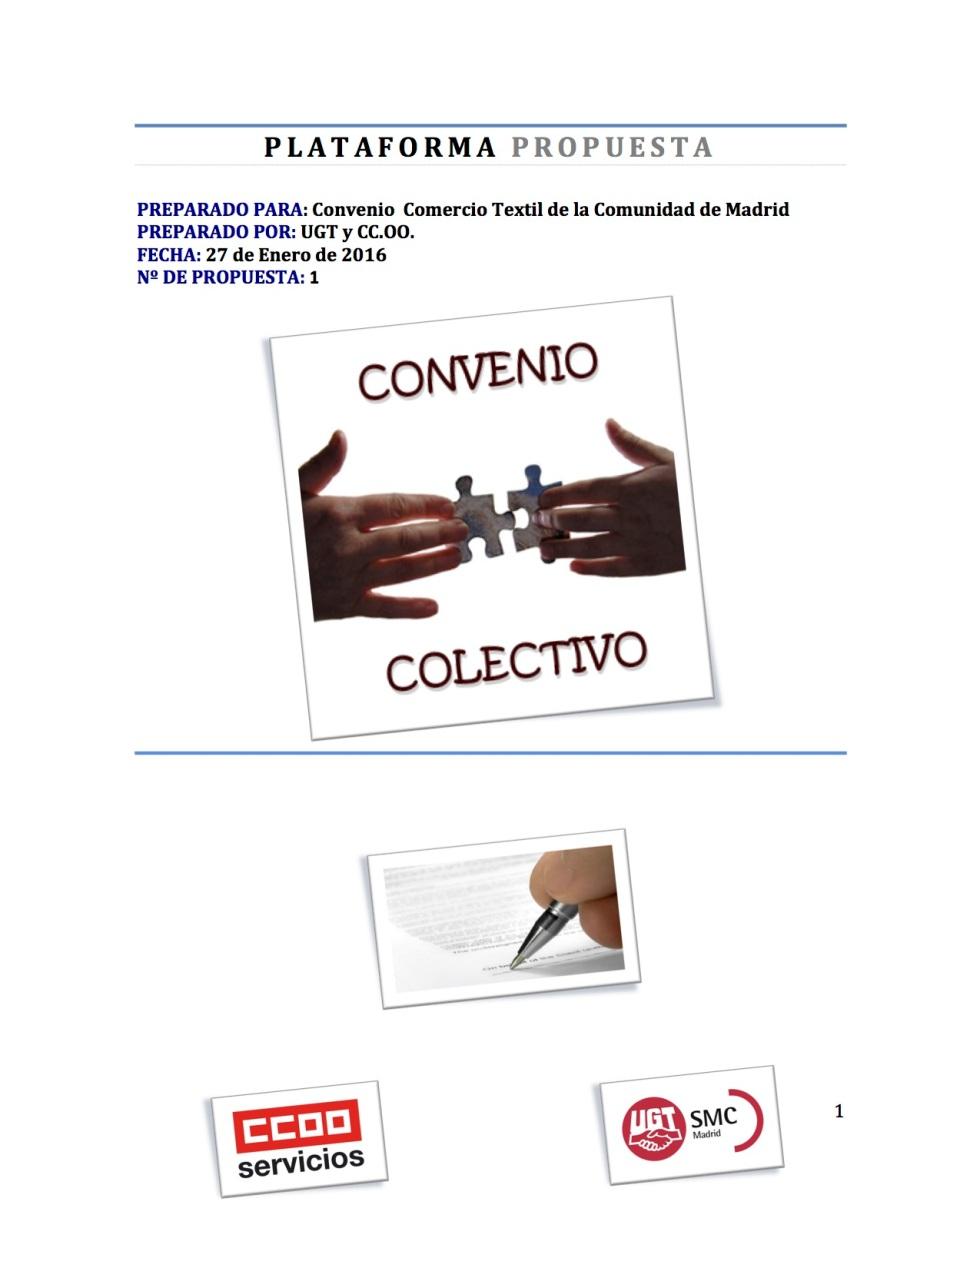 plataforma propuesta ugt-cc.oo. textil.jpg